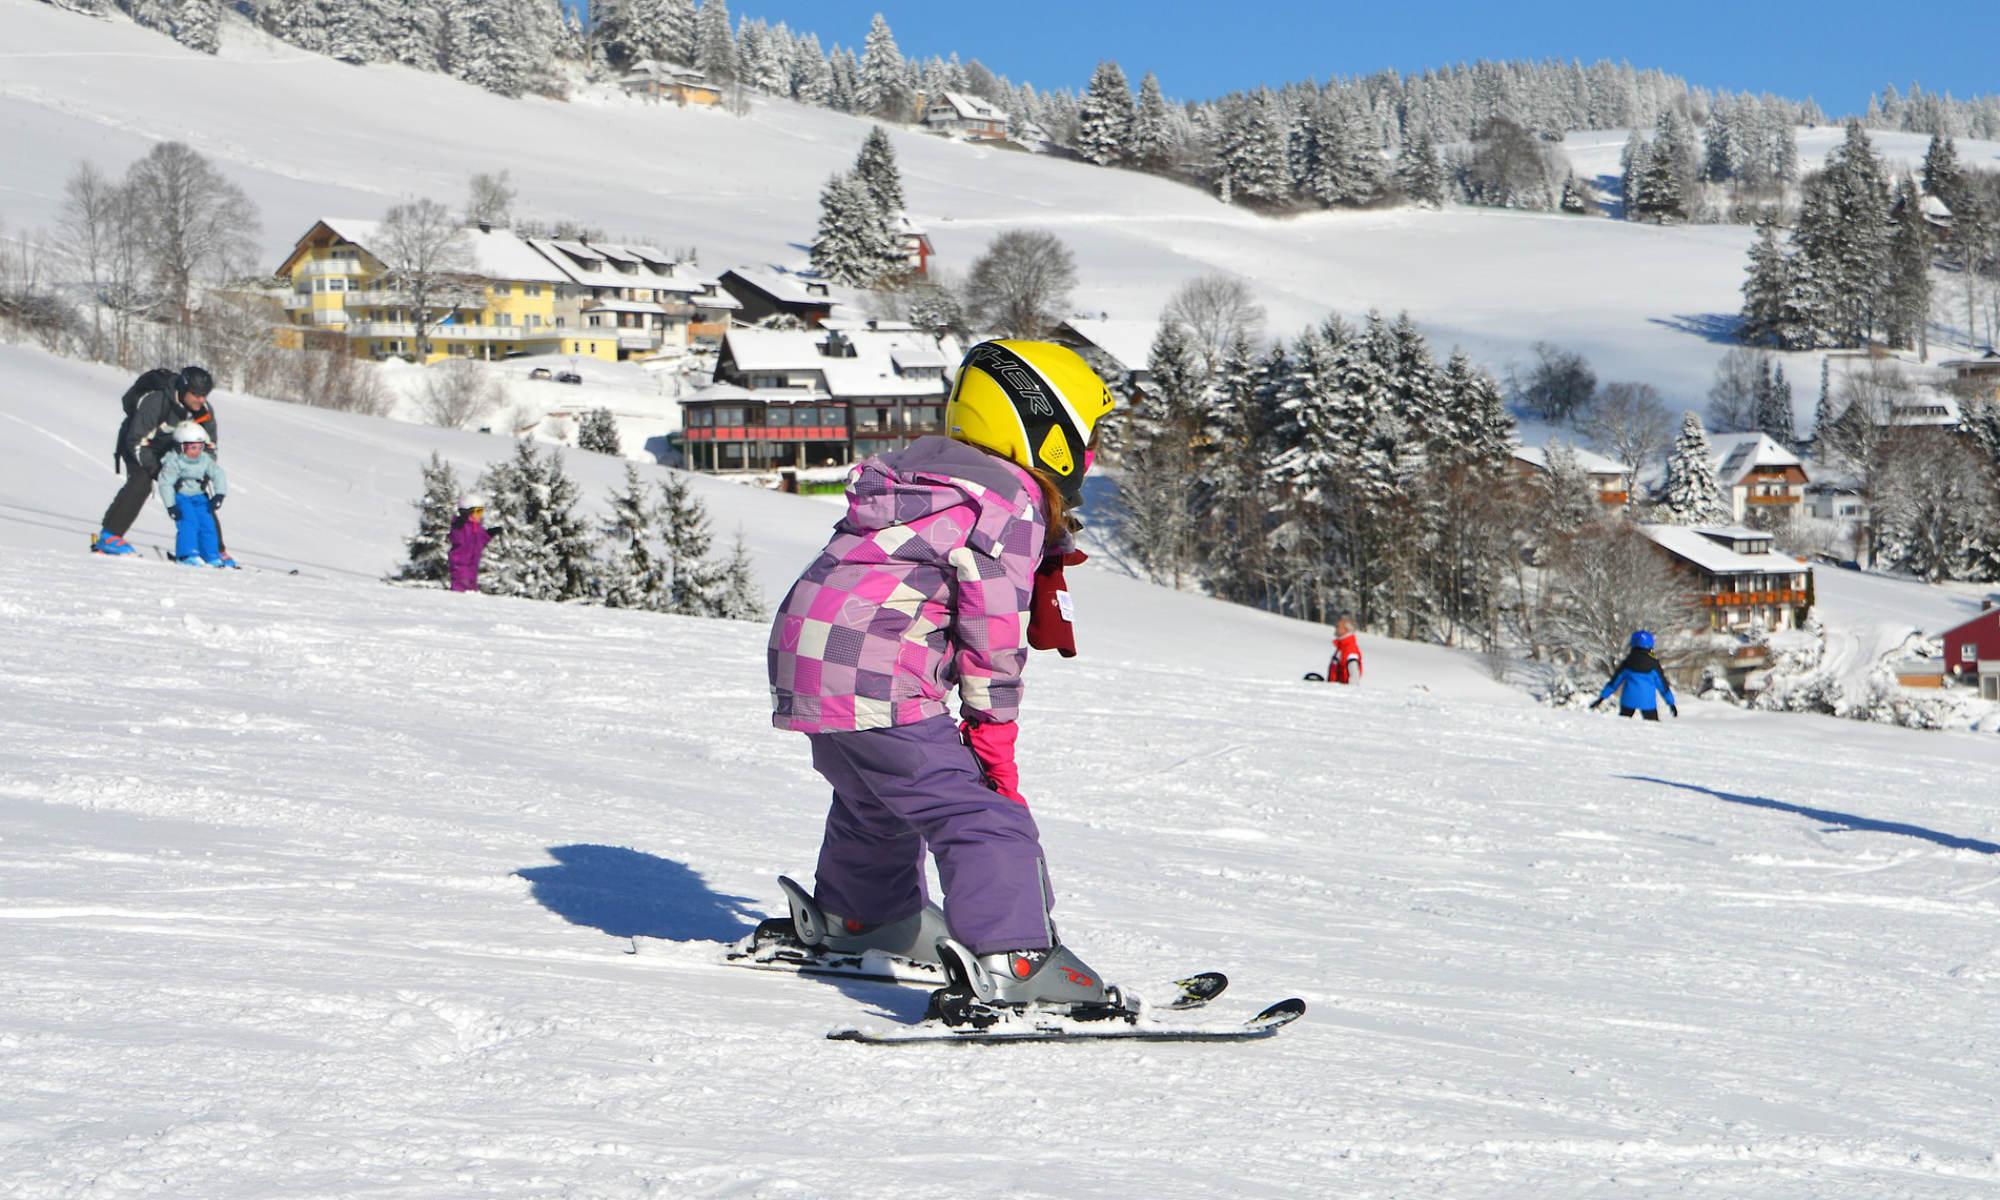 Une petite skieuse descend une piste de ski.